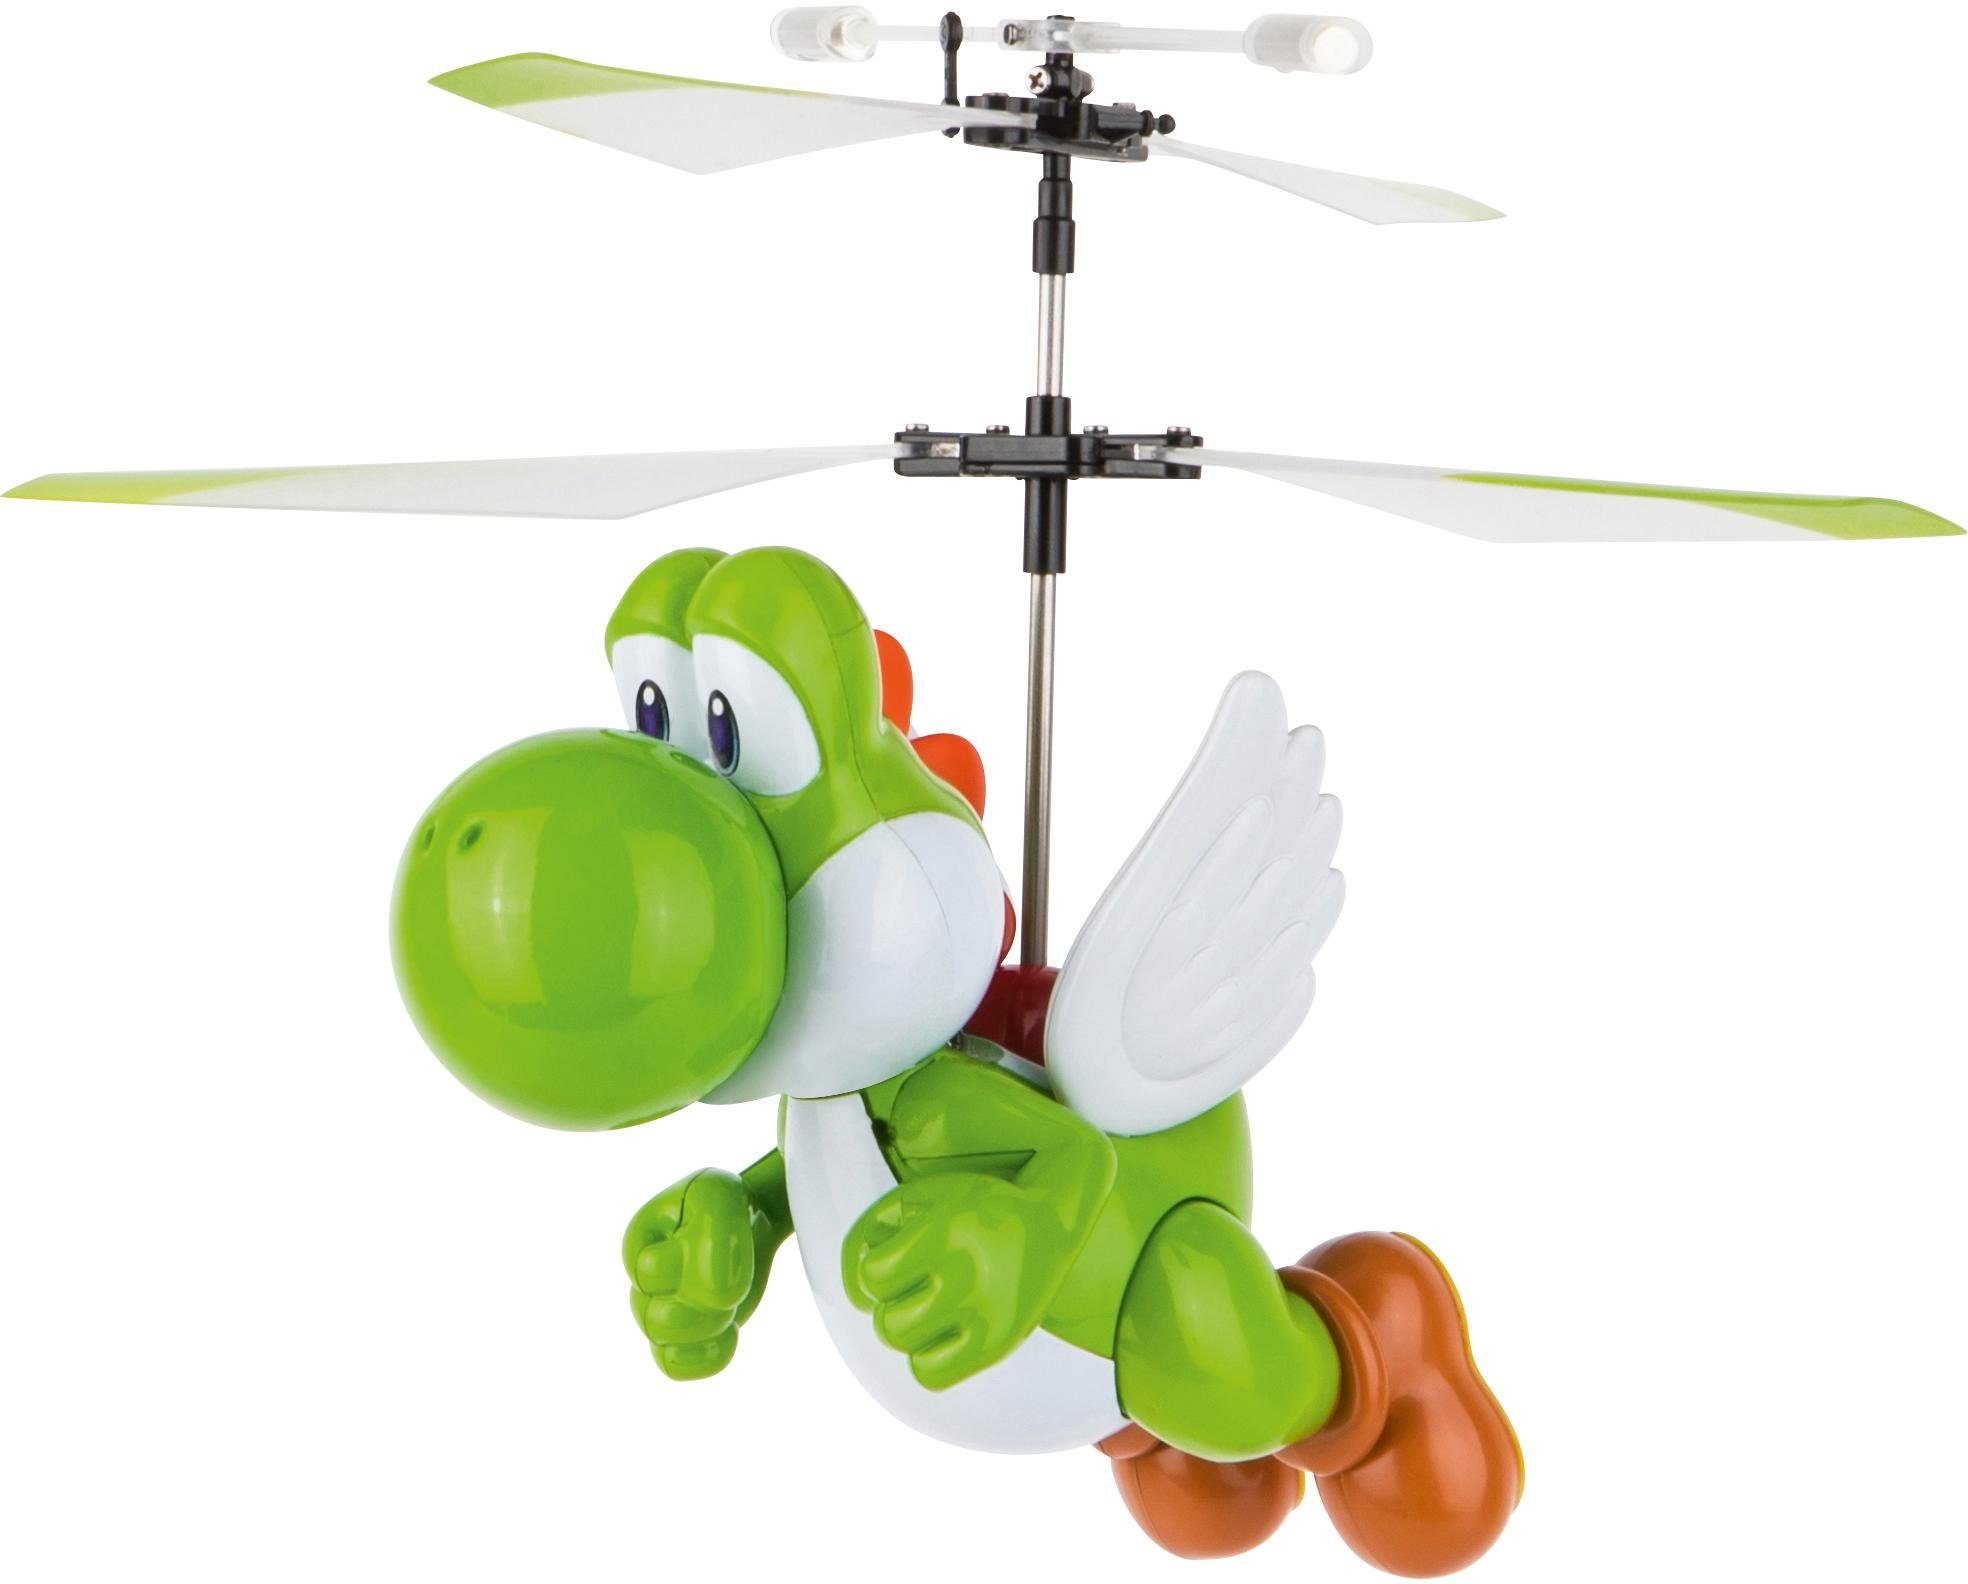 Carrera RC Flieger, »Carrera® RC Flieger Super Mario™, Flying Yoshi™«